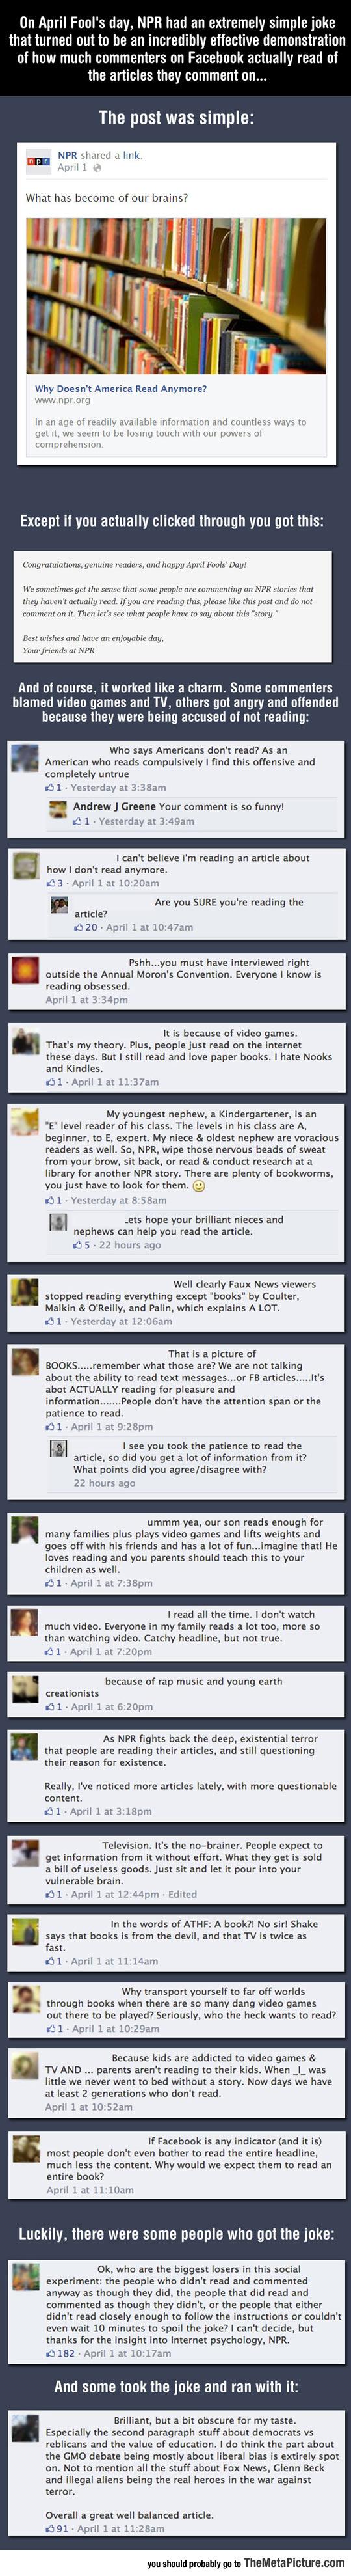 Brilliant Facebook Prank Tricks Dumb People Who Consider Themselves Smart